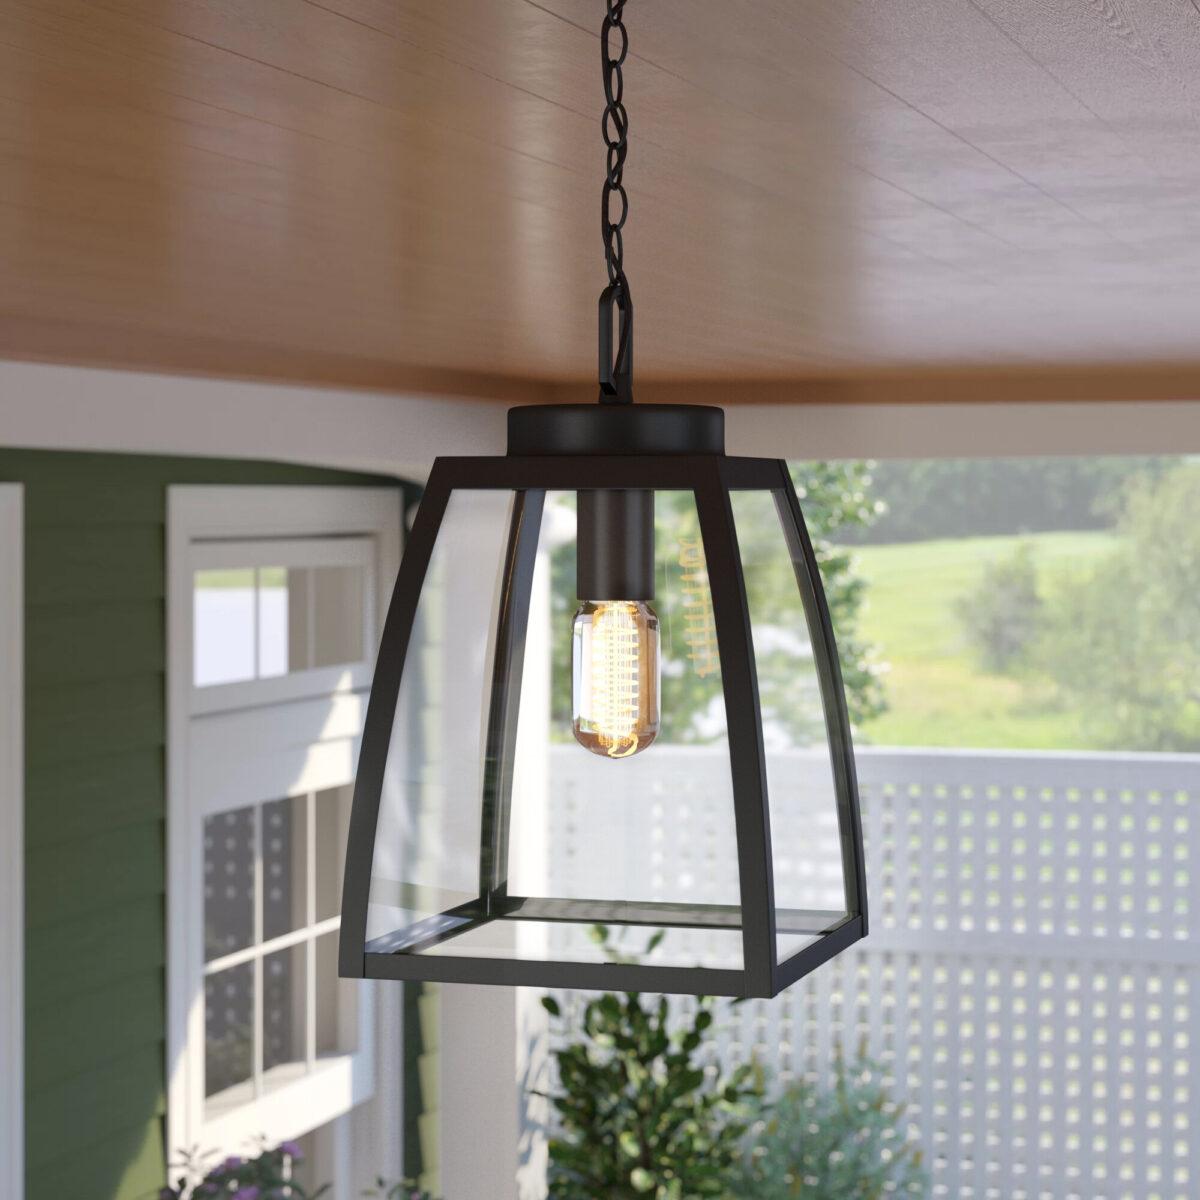 lighting-the-veranda-project-and-ideas-15